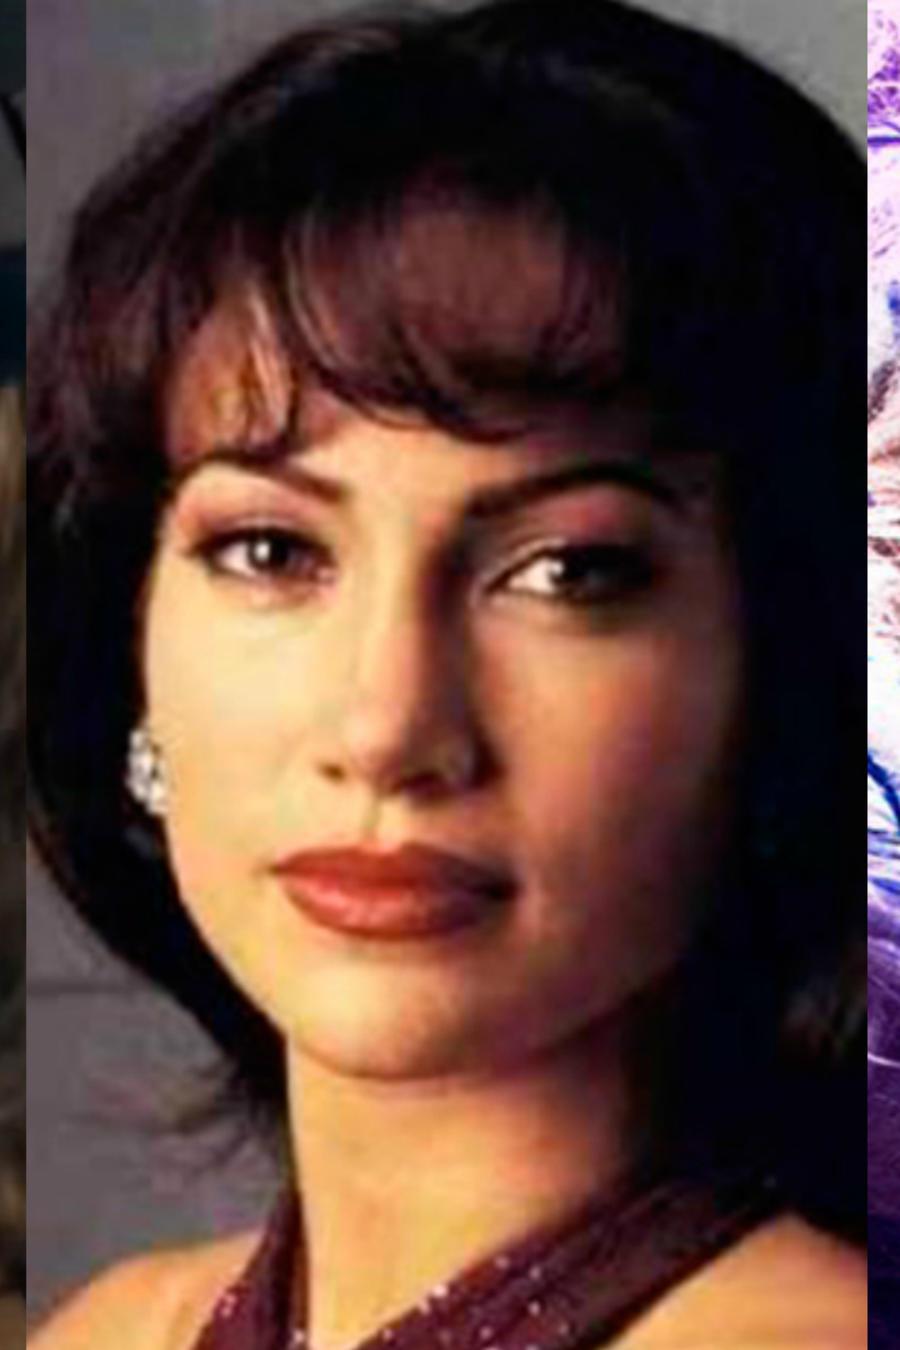 Joseph Fiennes como Michael Jackson, Jennifer Lopez como Selena y Aymee Nuviola como Celia Cruz.